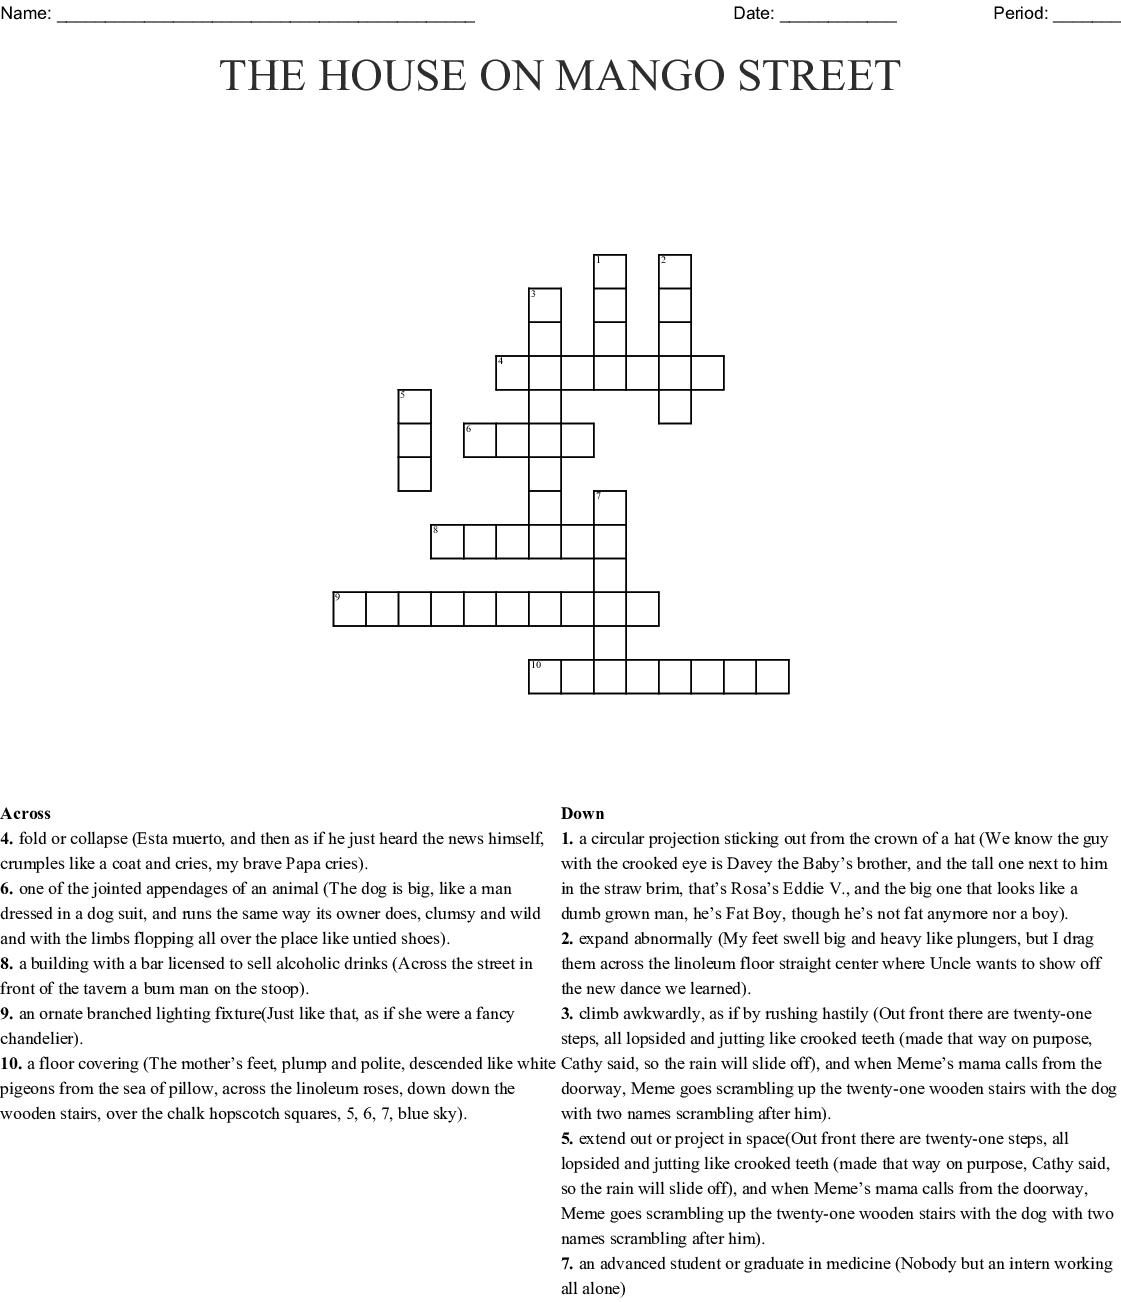 The House On Mango Street Crossword